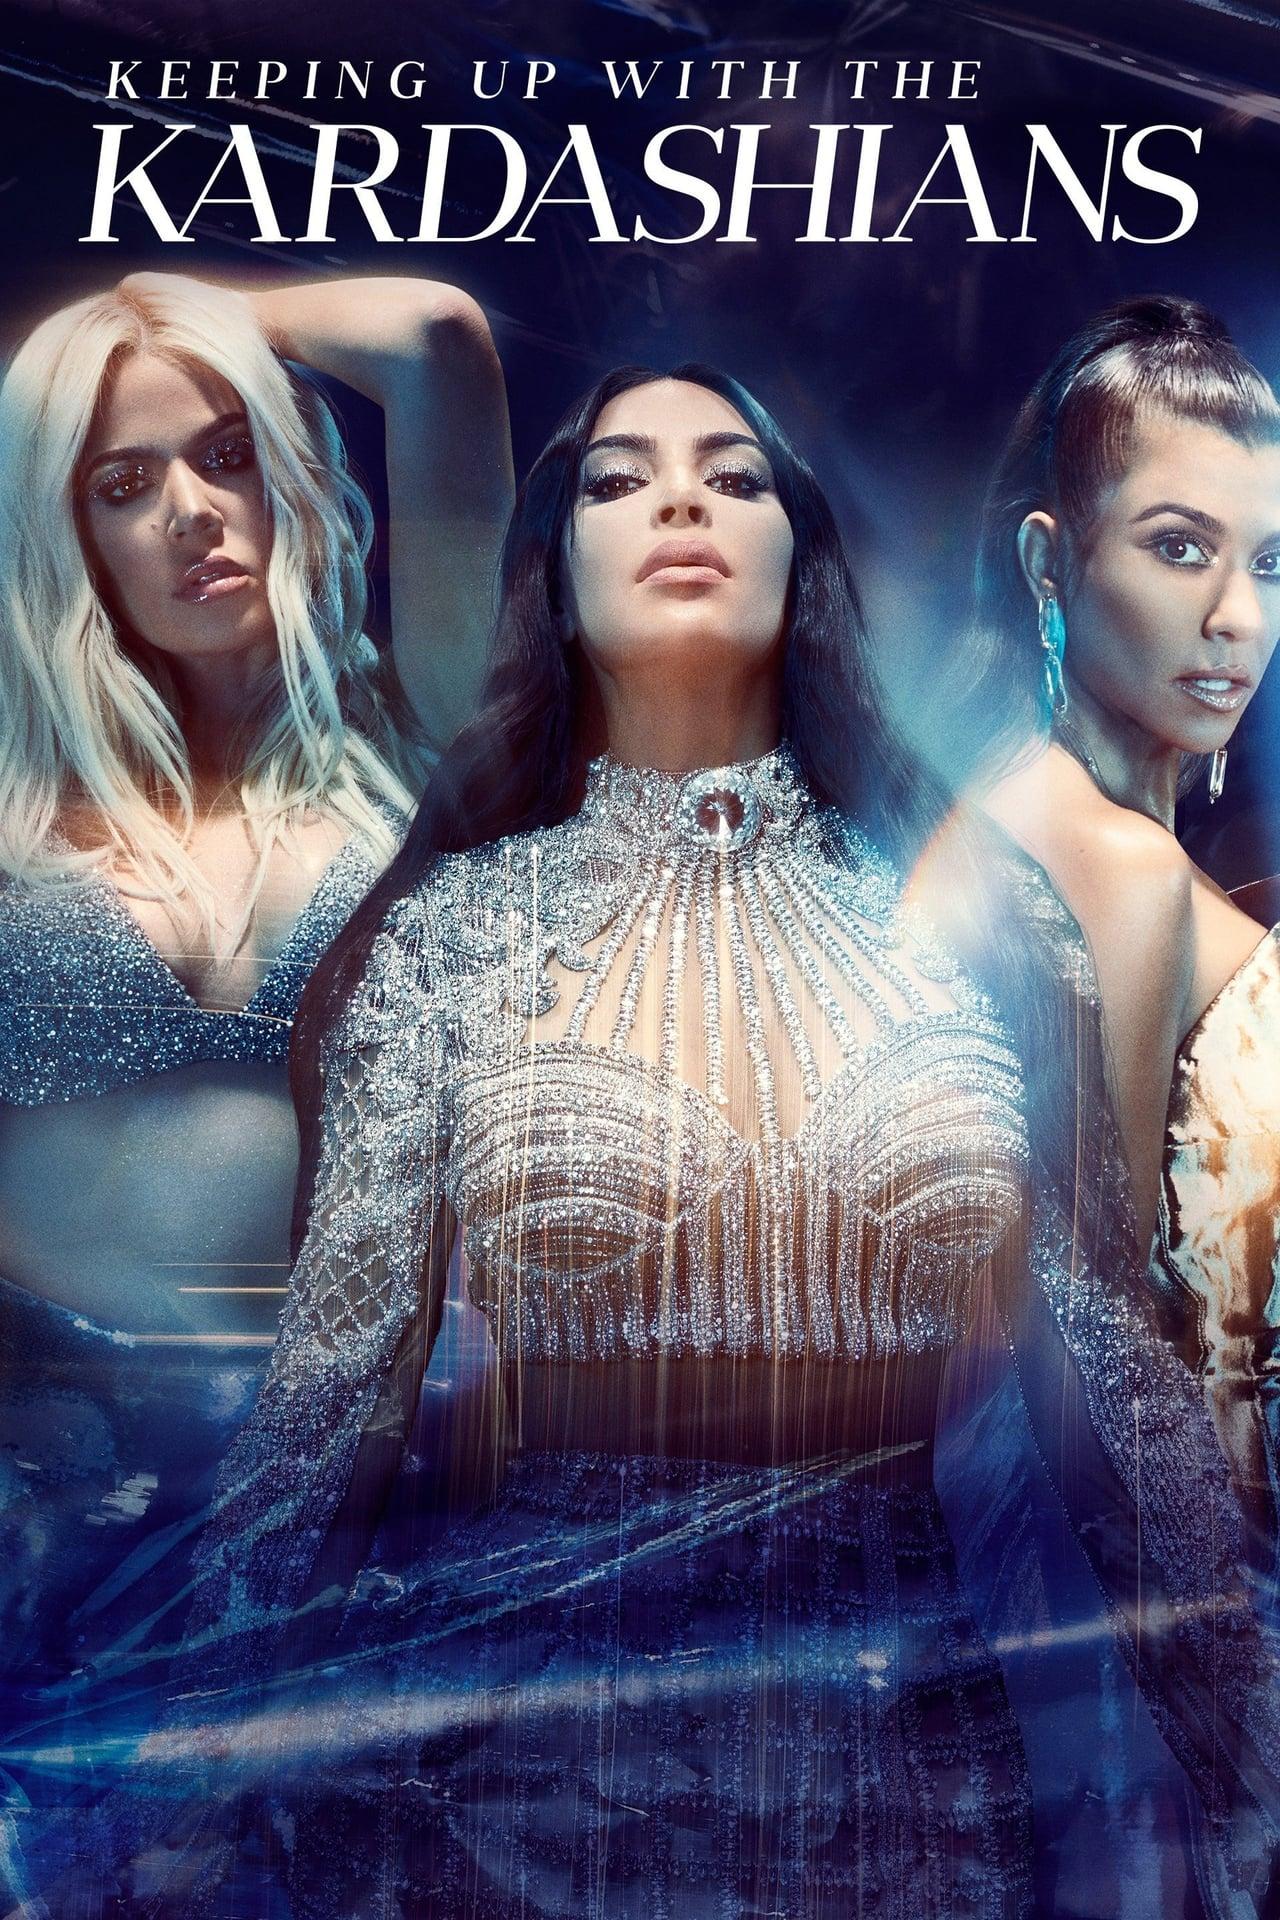 Keeping Up With The Kardashians Season 16